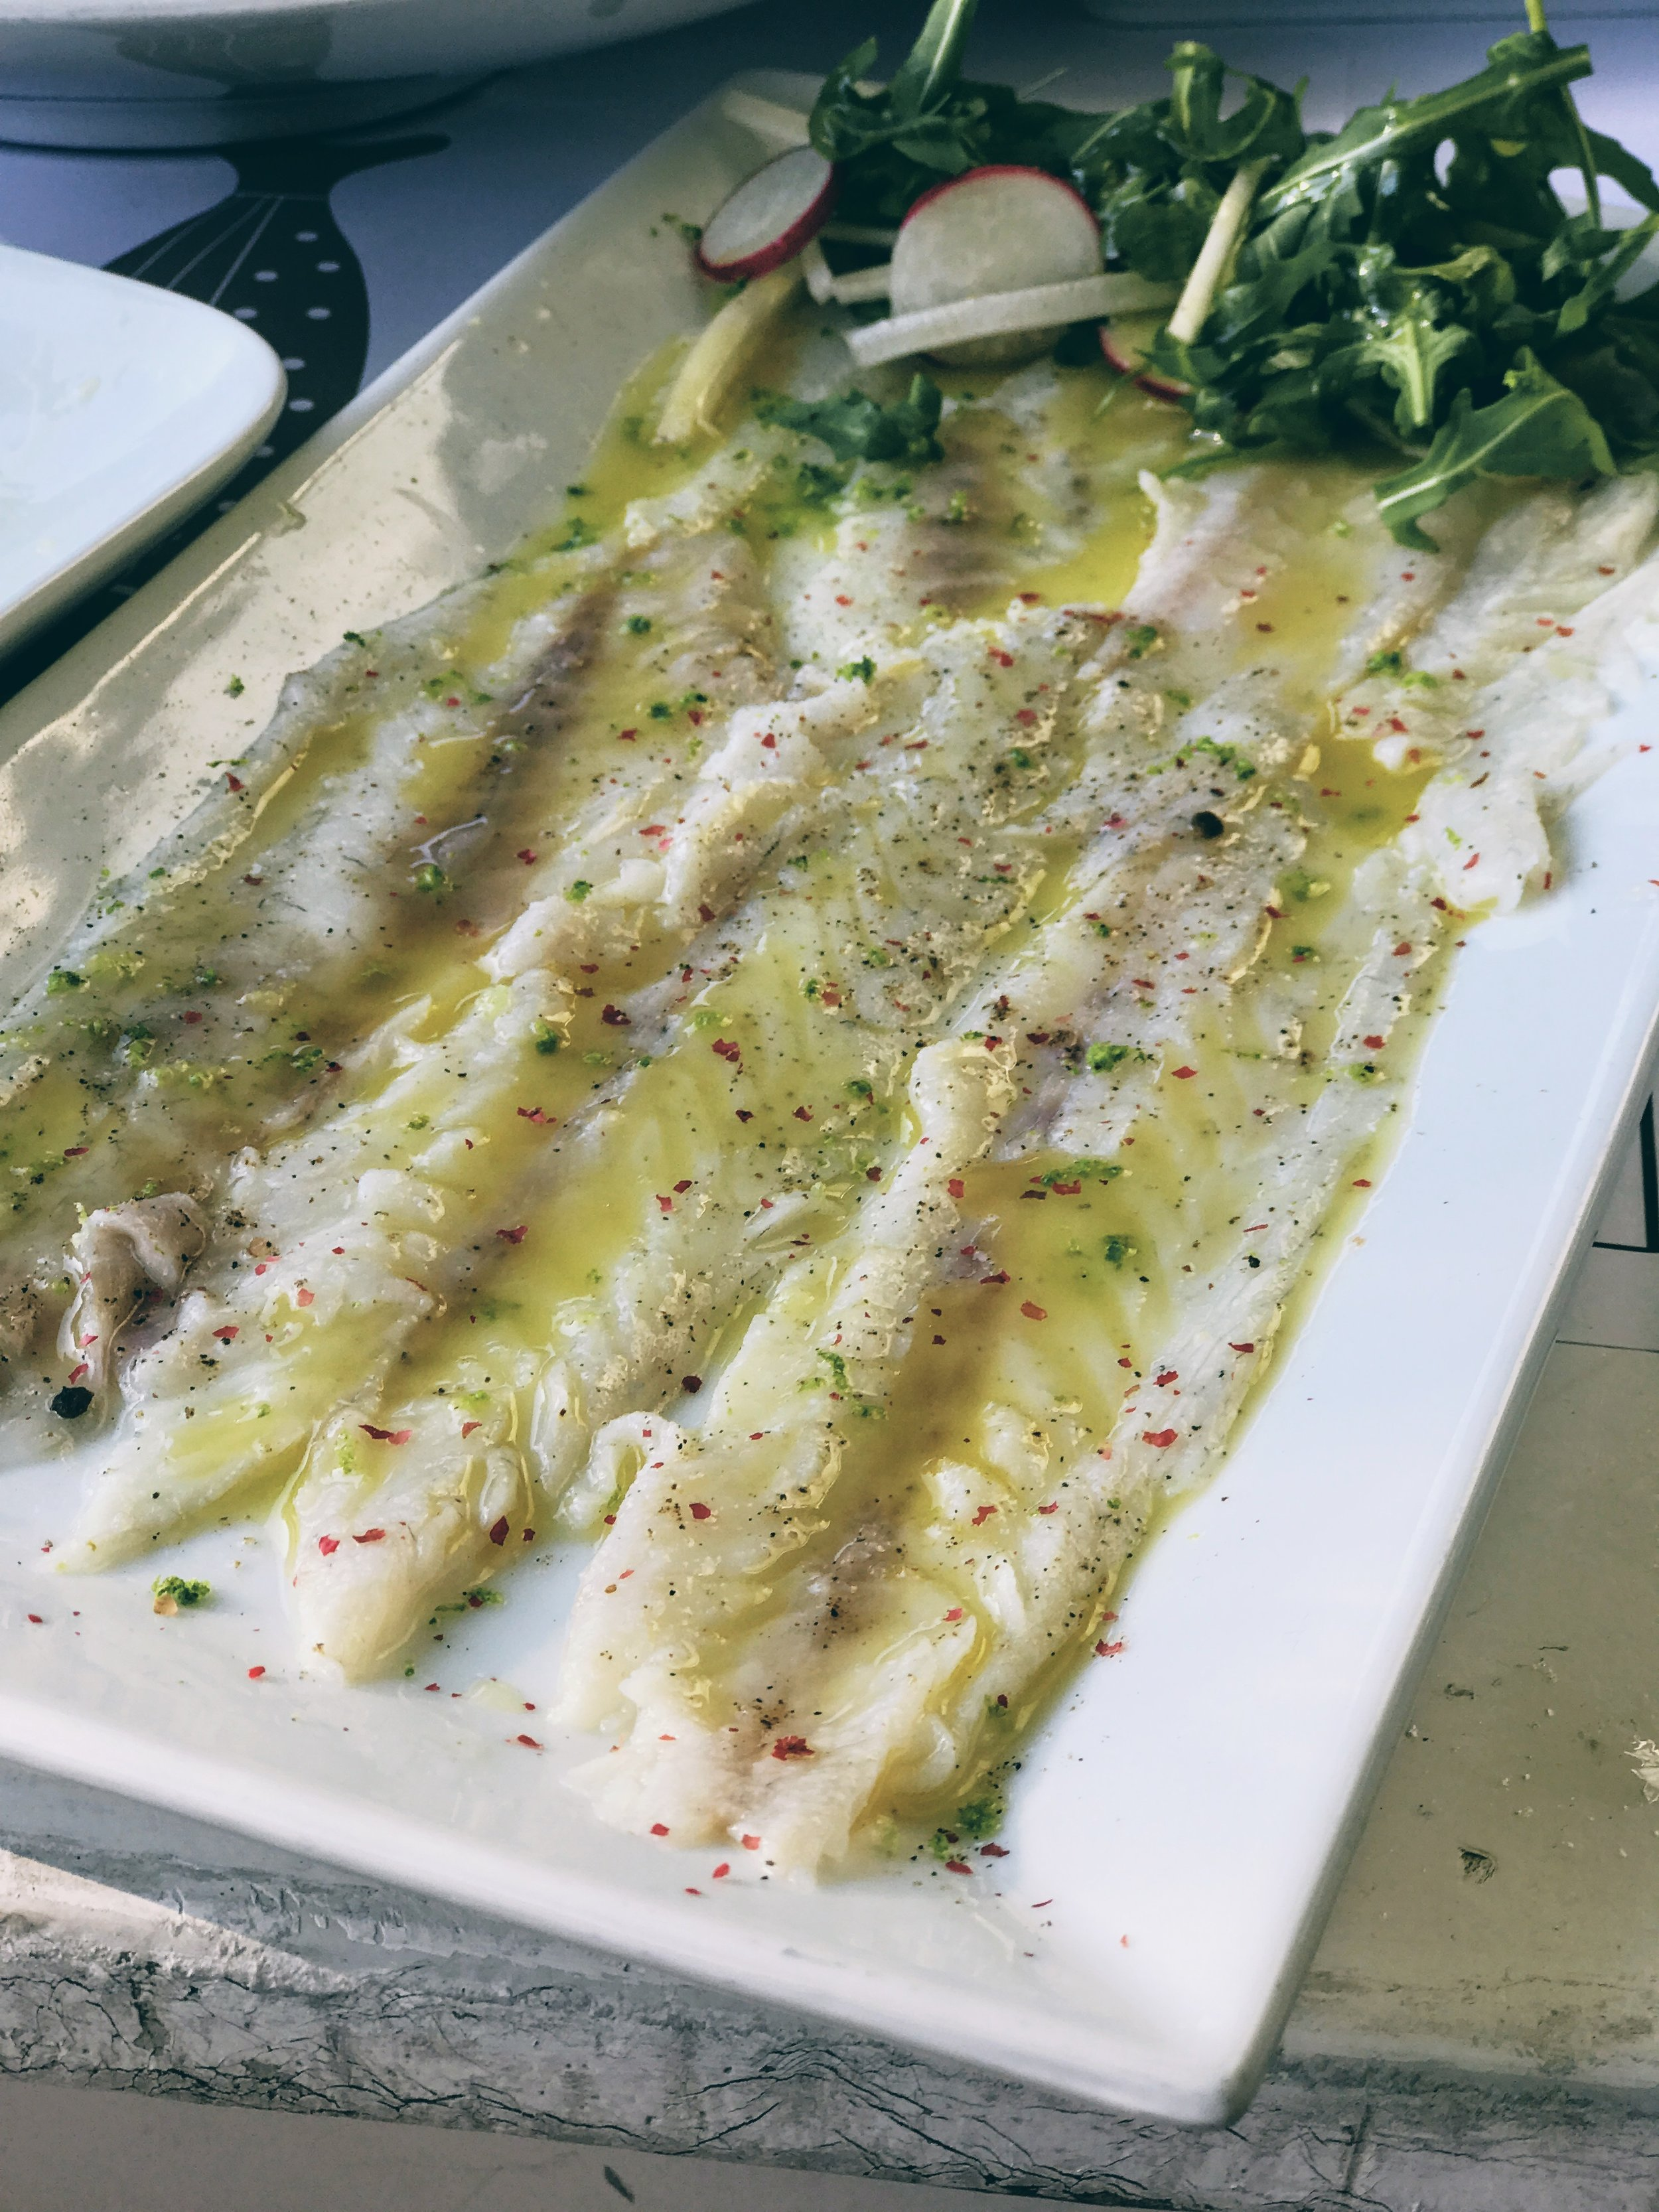 Perfectly marinated seabass